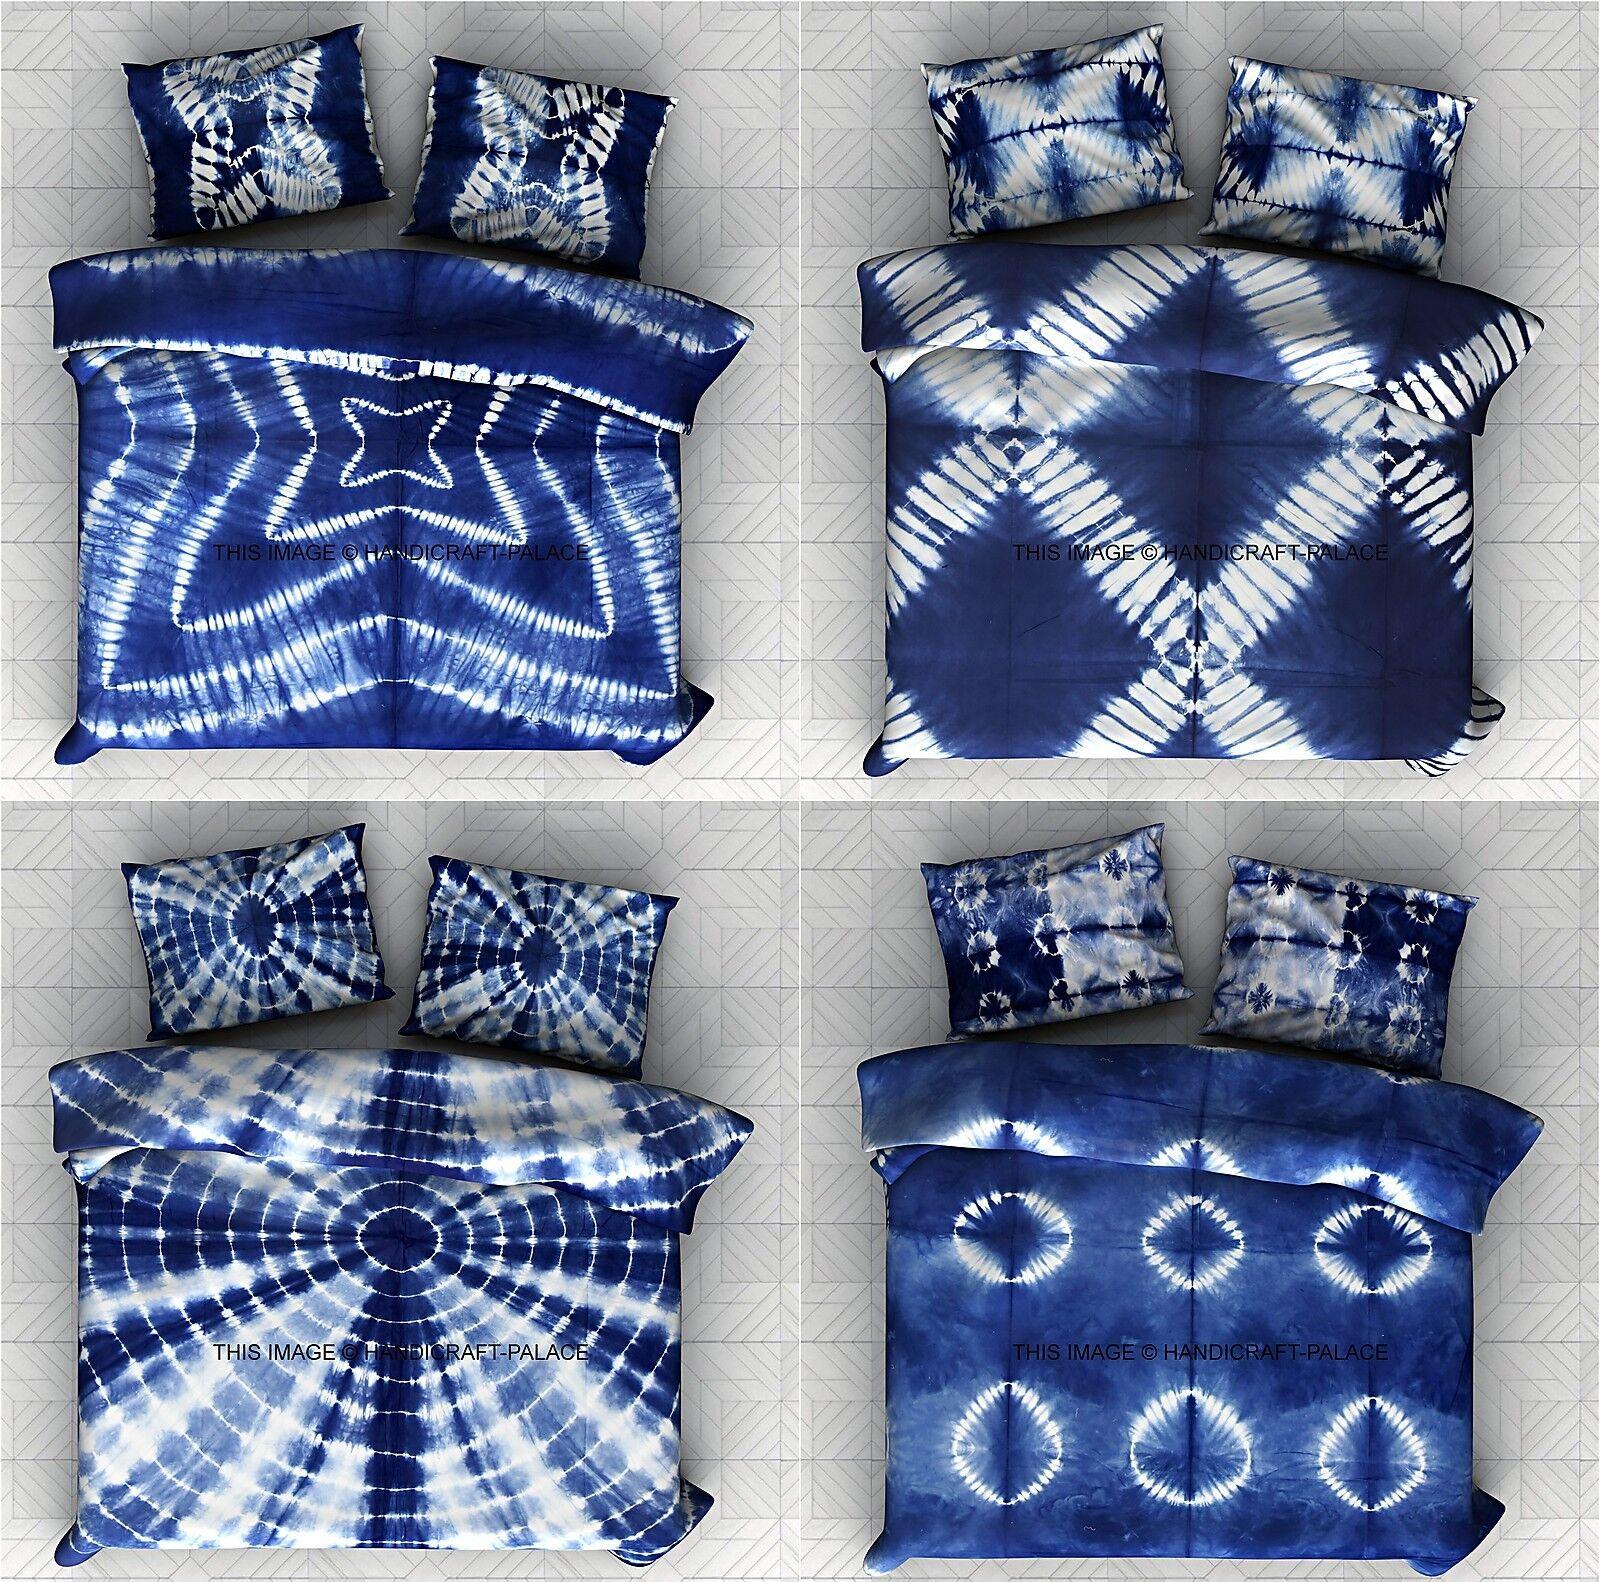 5 PC Wholesale Lot Tie Dye Indigo Blau Shibori King Duvet Blanket Cover Indian